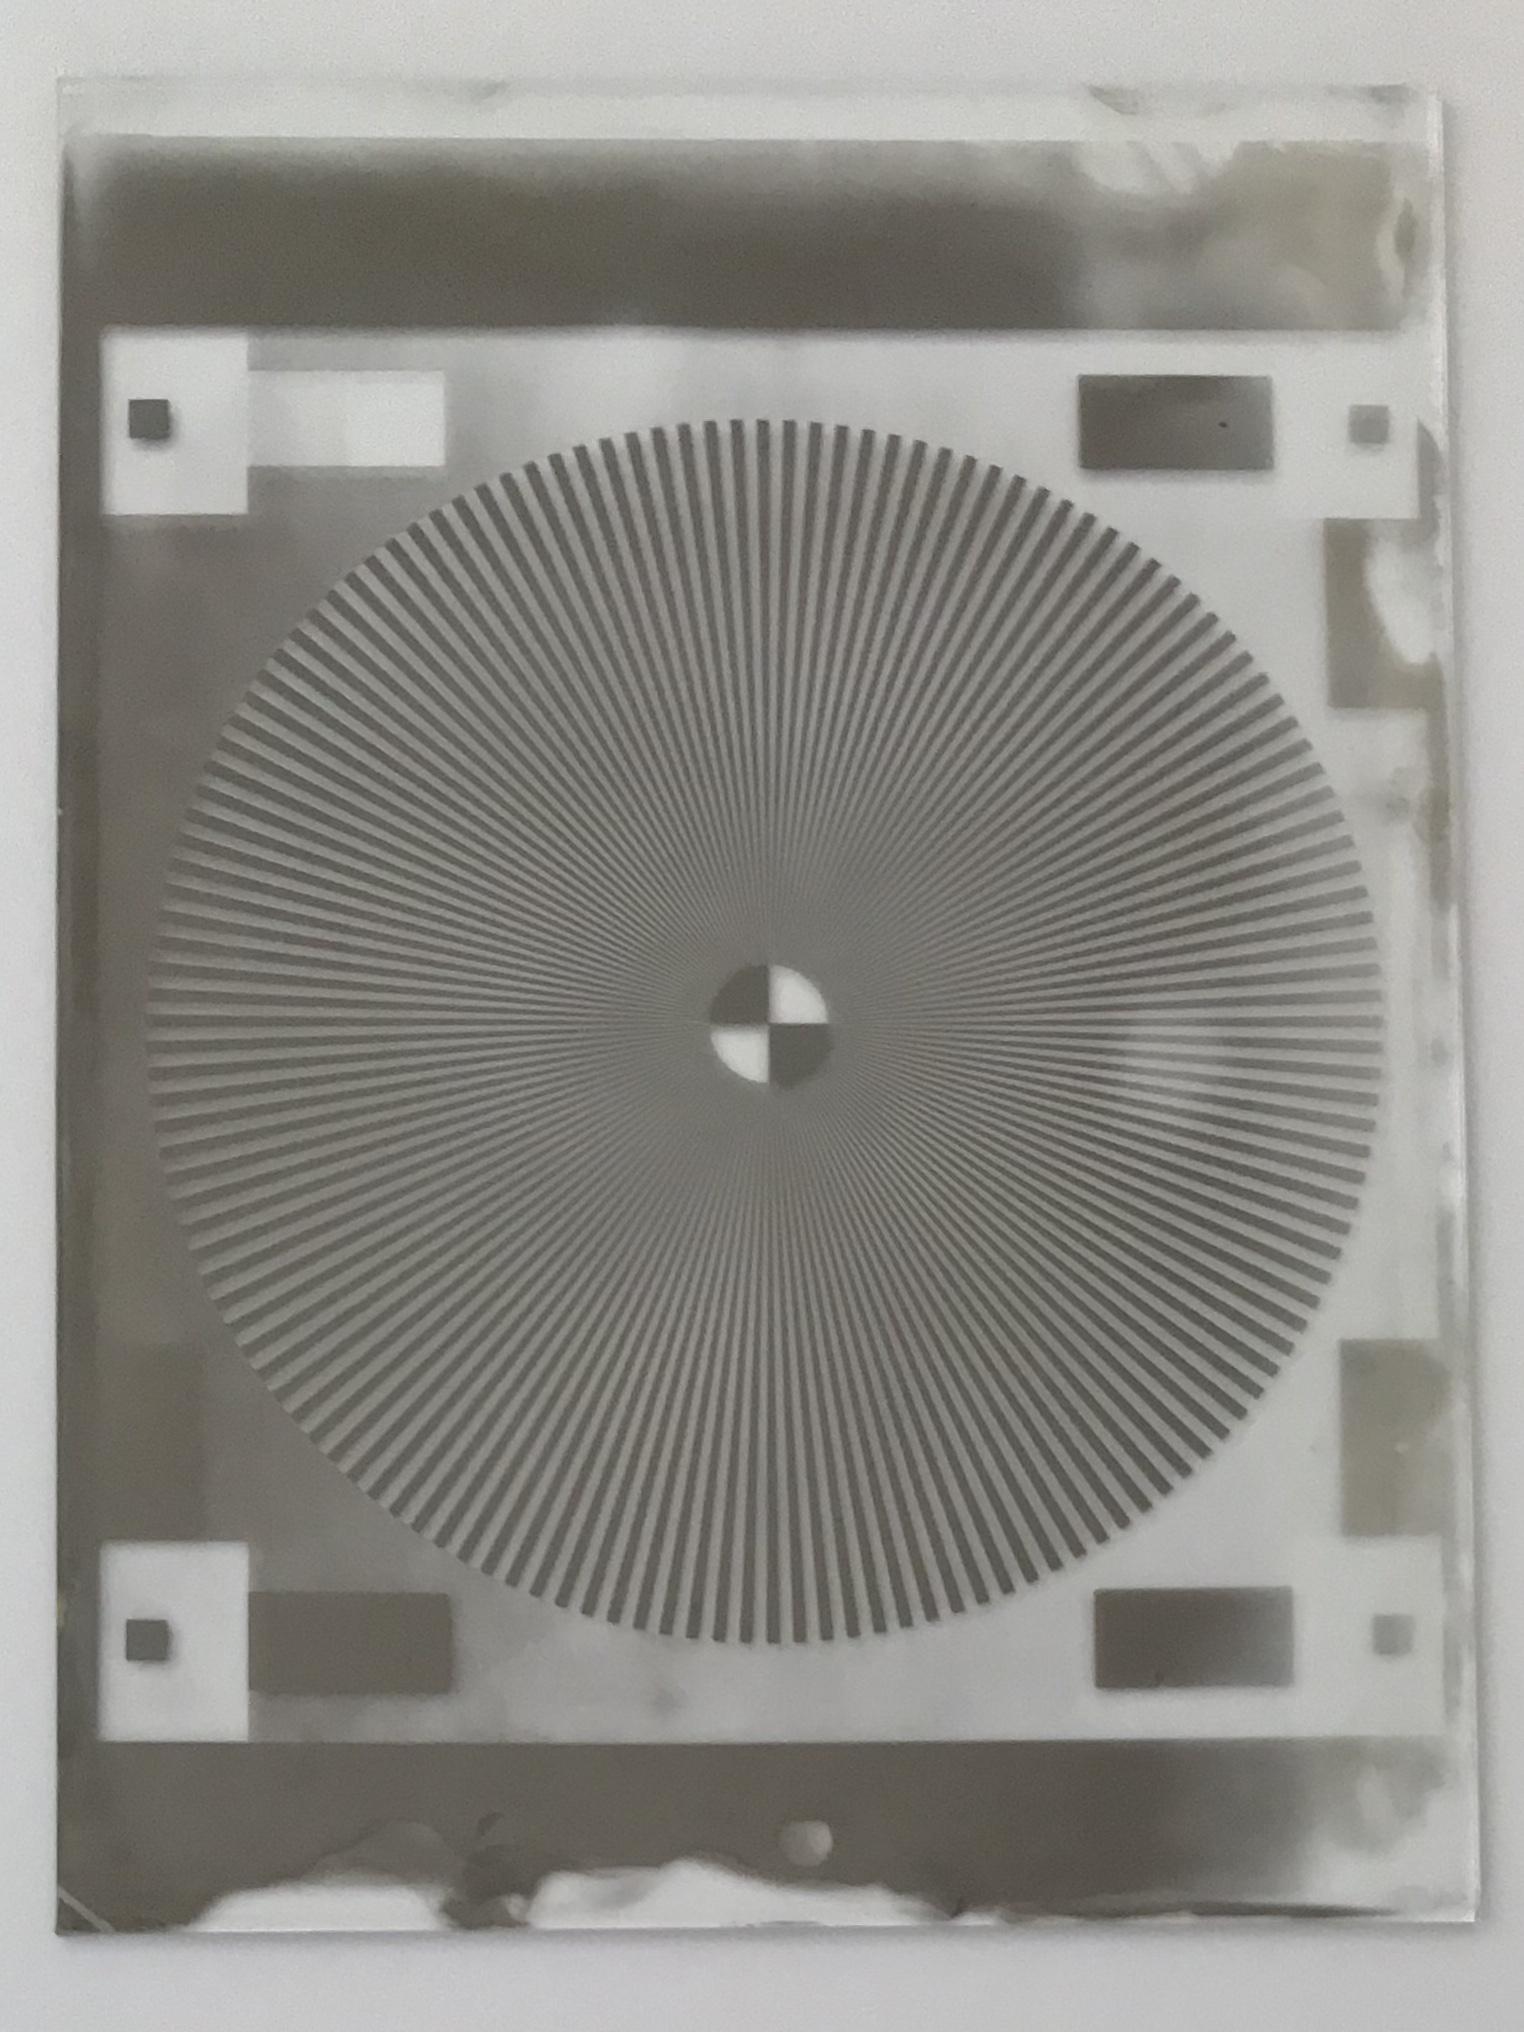 BroombergChanarin - _I held back the tears._ - 2017 - Lense sharpness test on 8_x10_ collodion glass plates.jpg